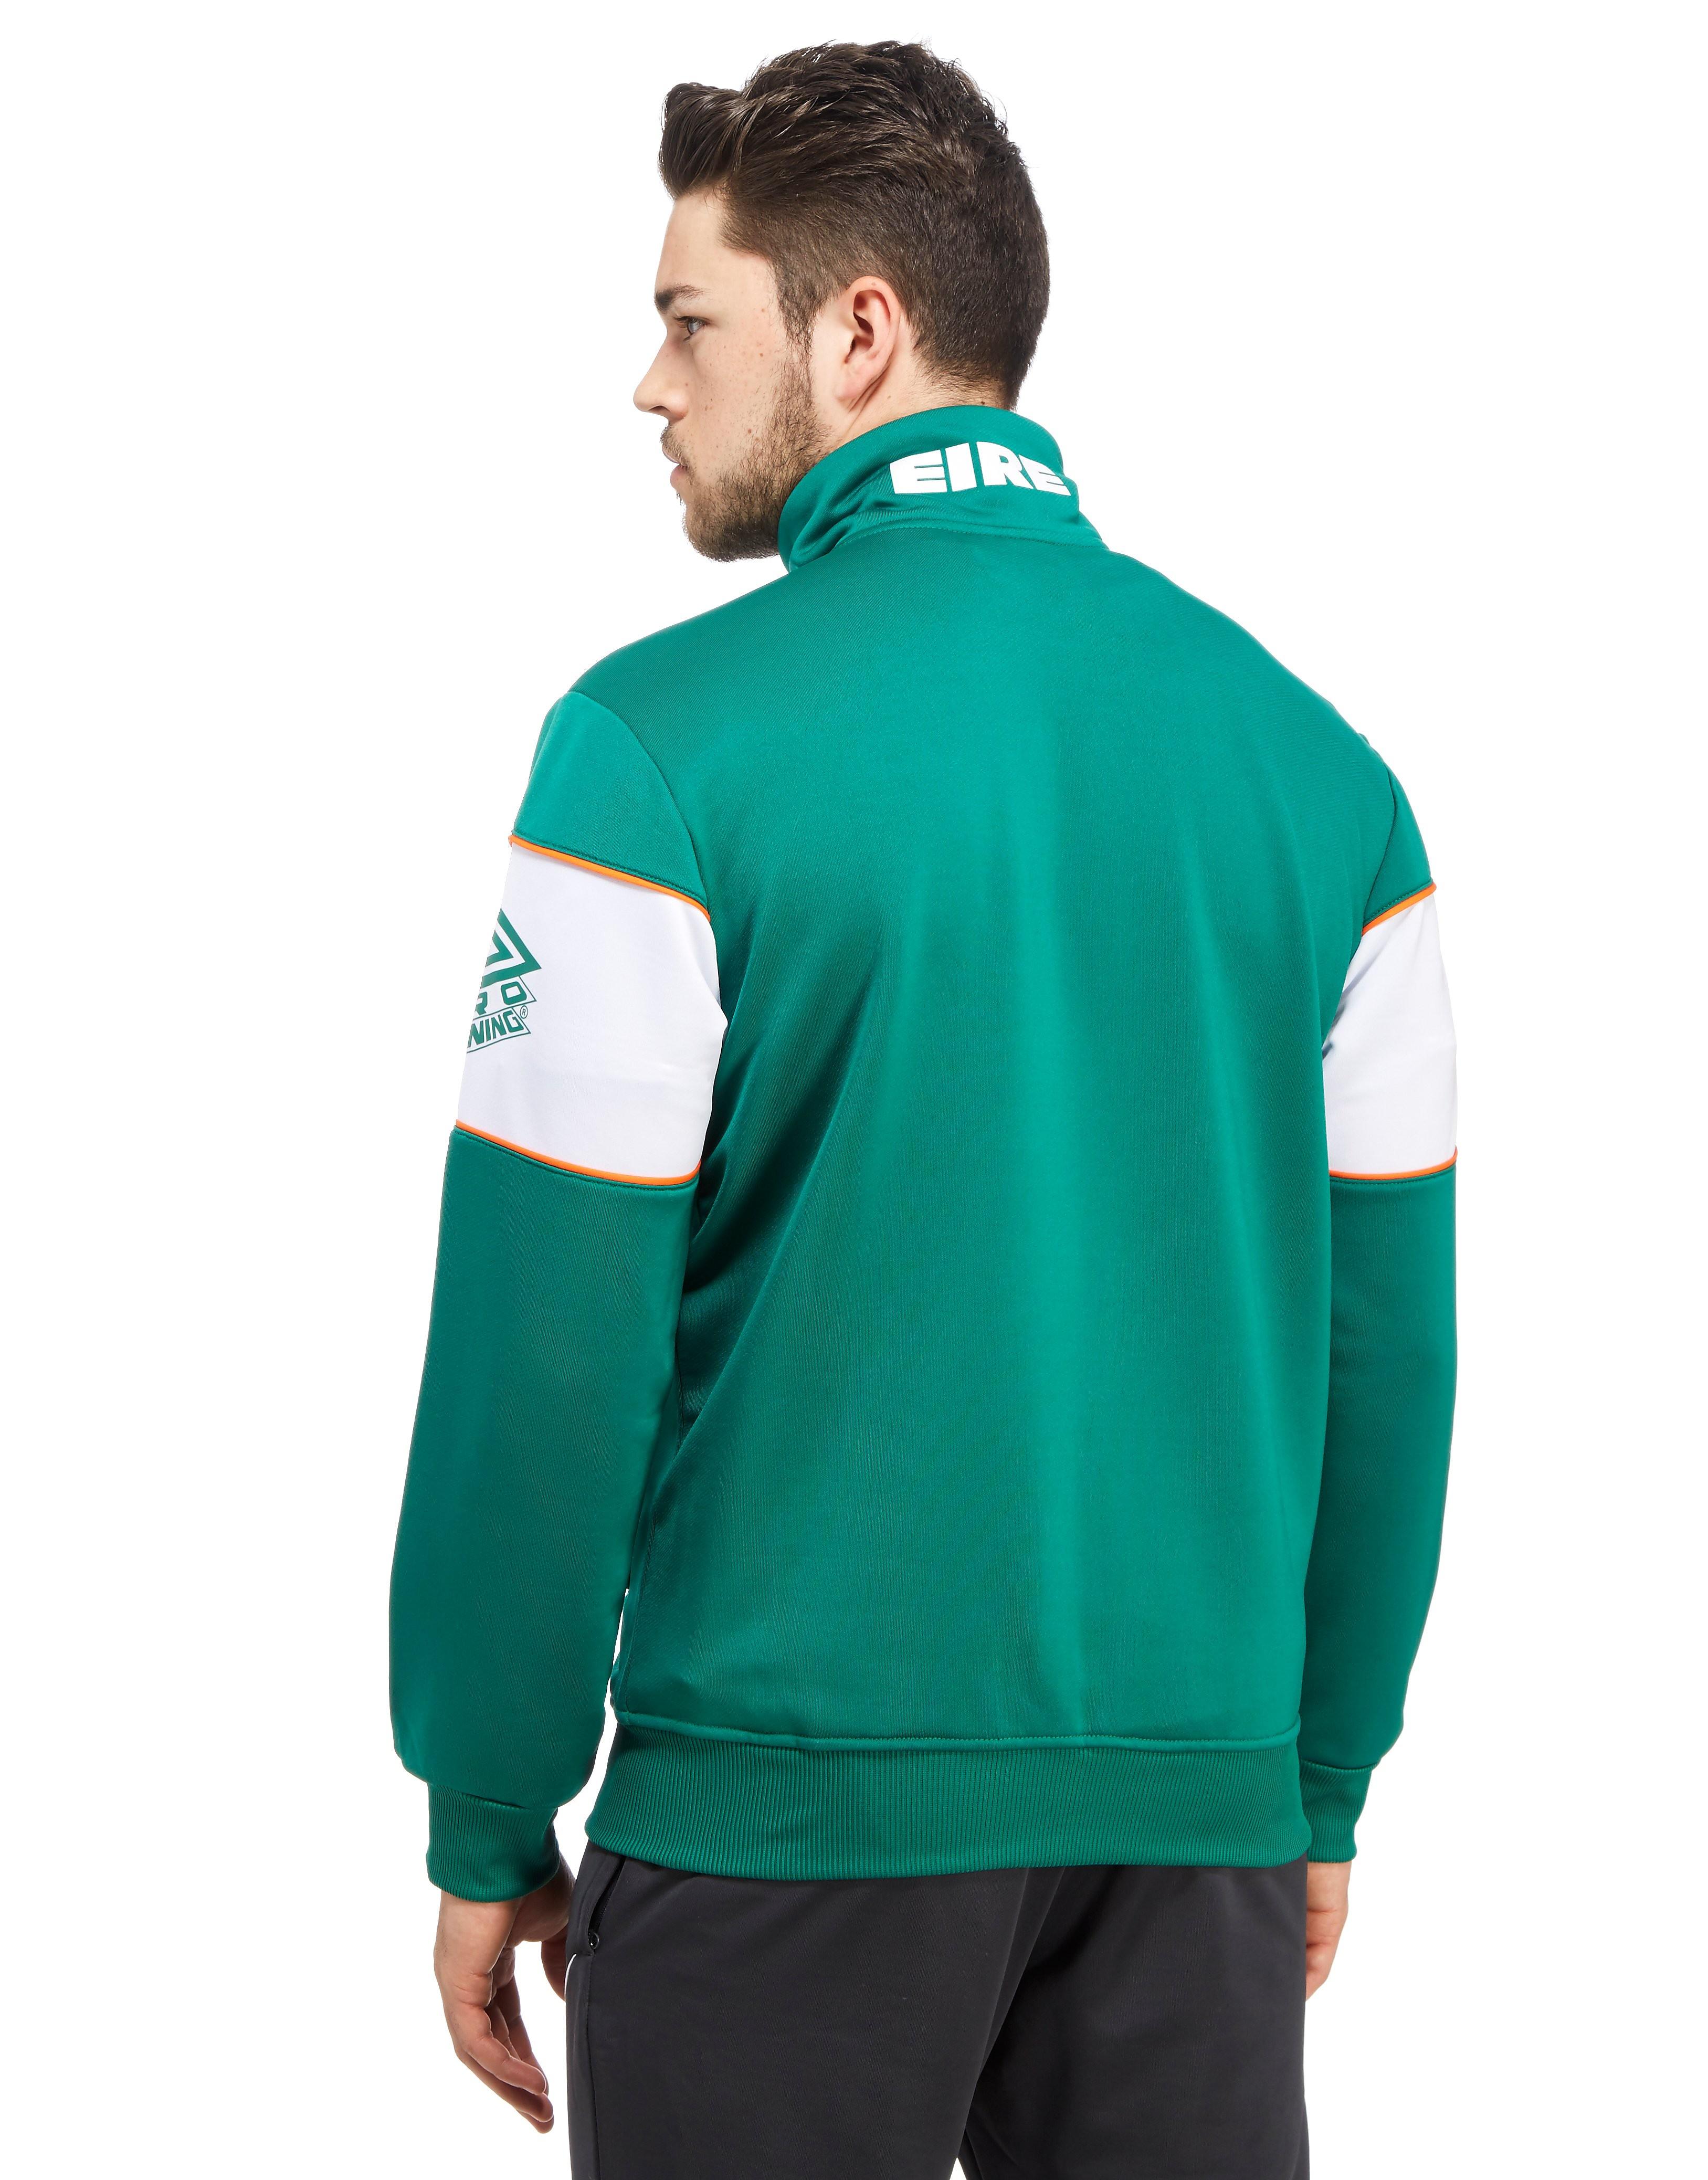 Umbro FAI Pro Training Jacket